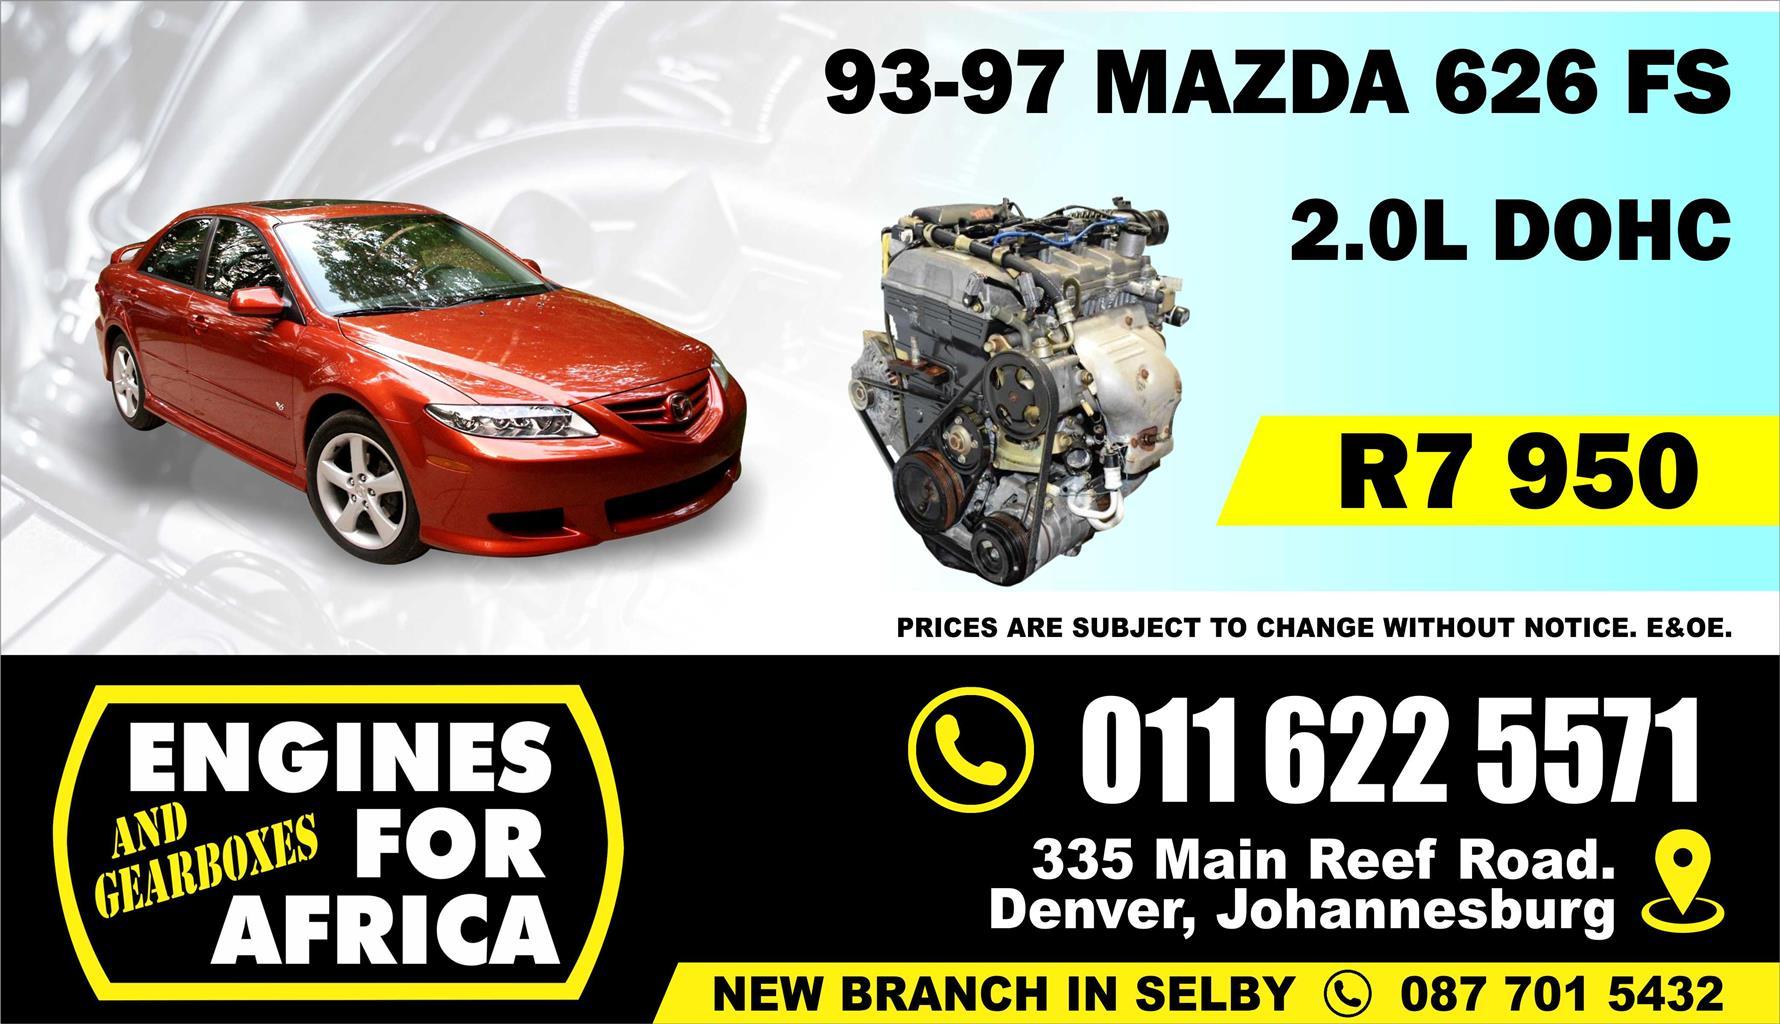 Used Mazda 626 FS 2 0L DOHC 93-97 Engine FOR SALE